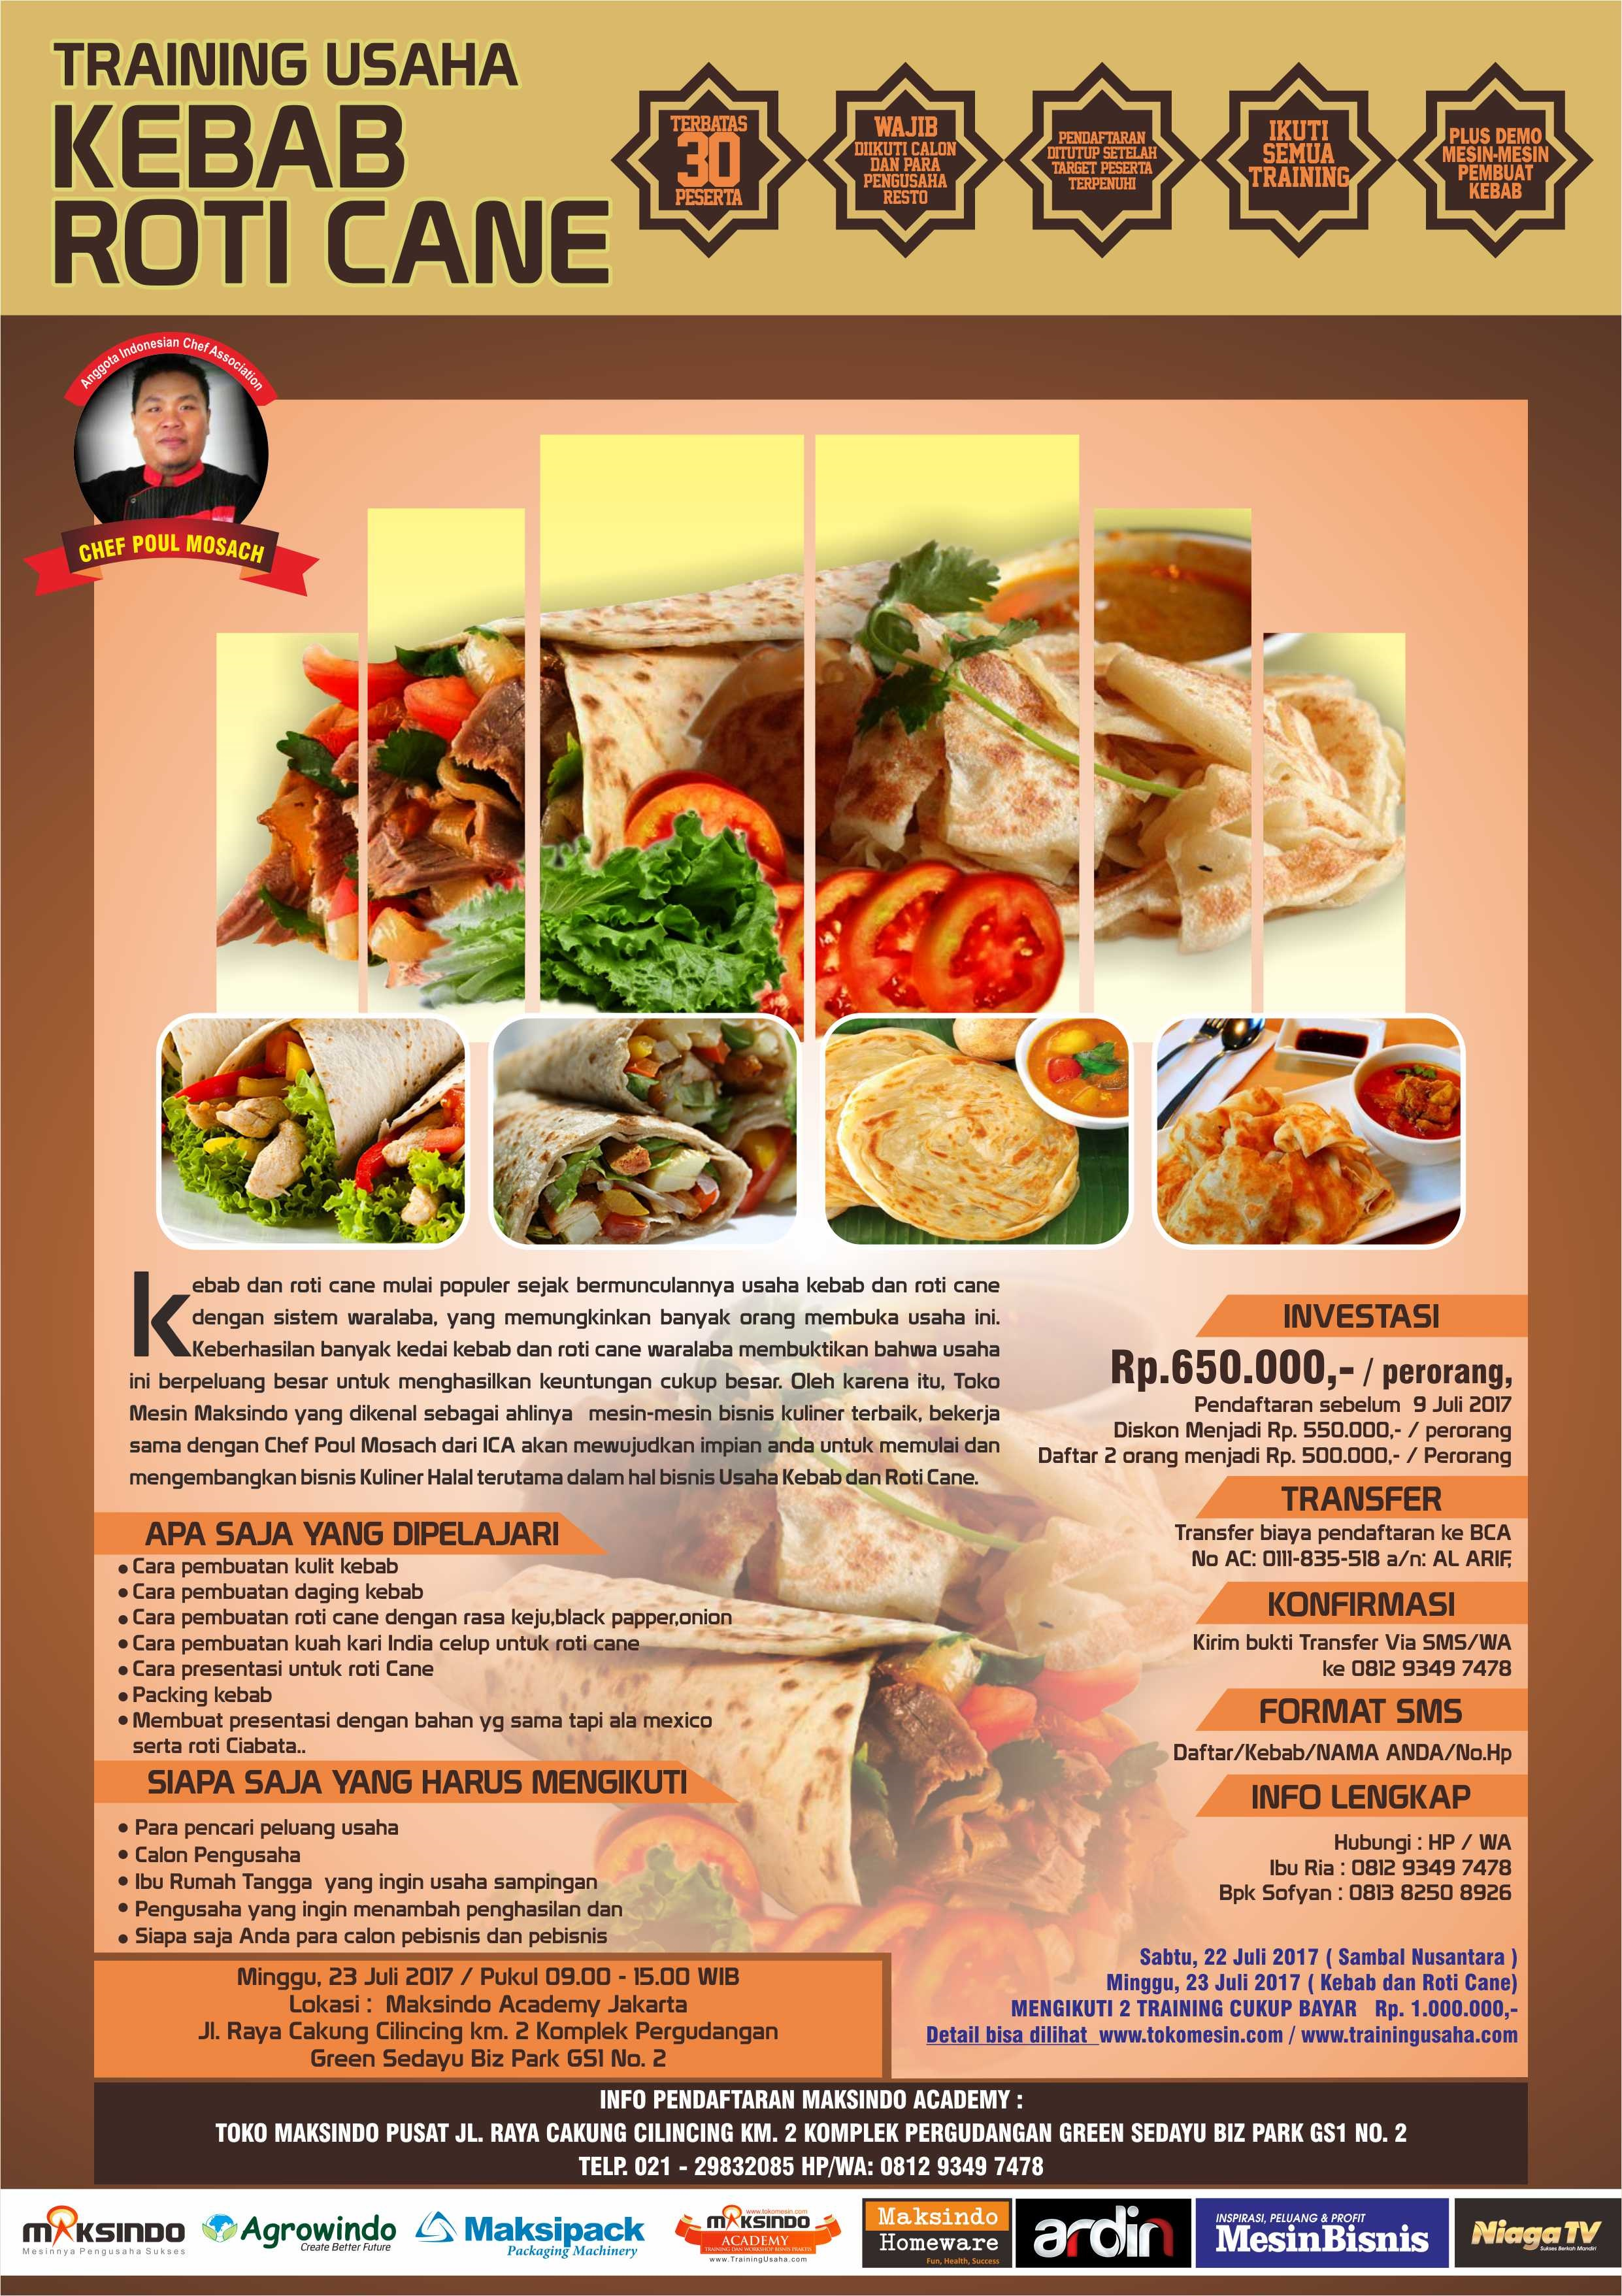 Training Usaha Kebab Roti Cane, 23 Juli 2017